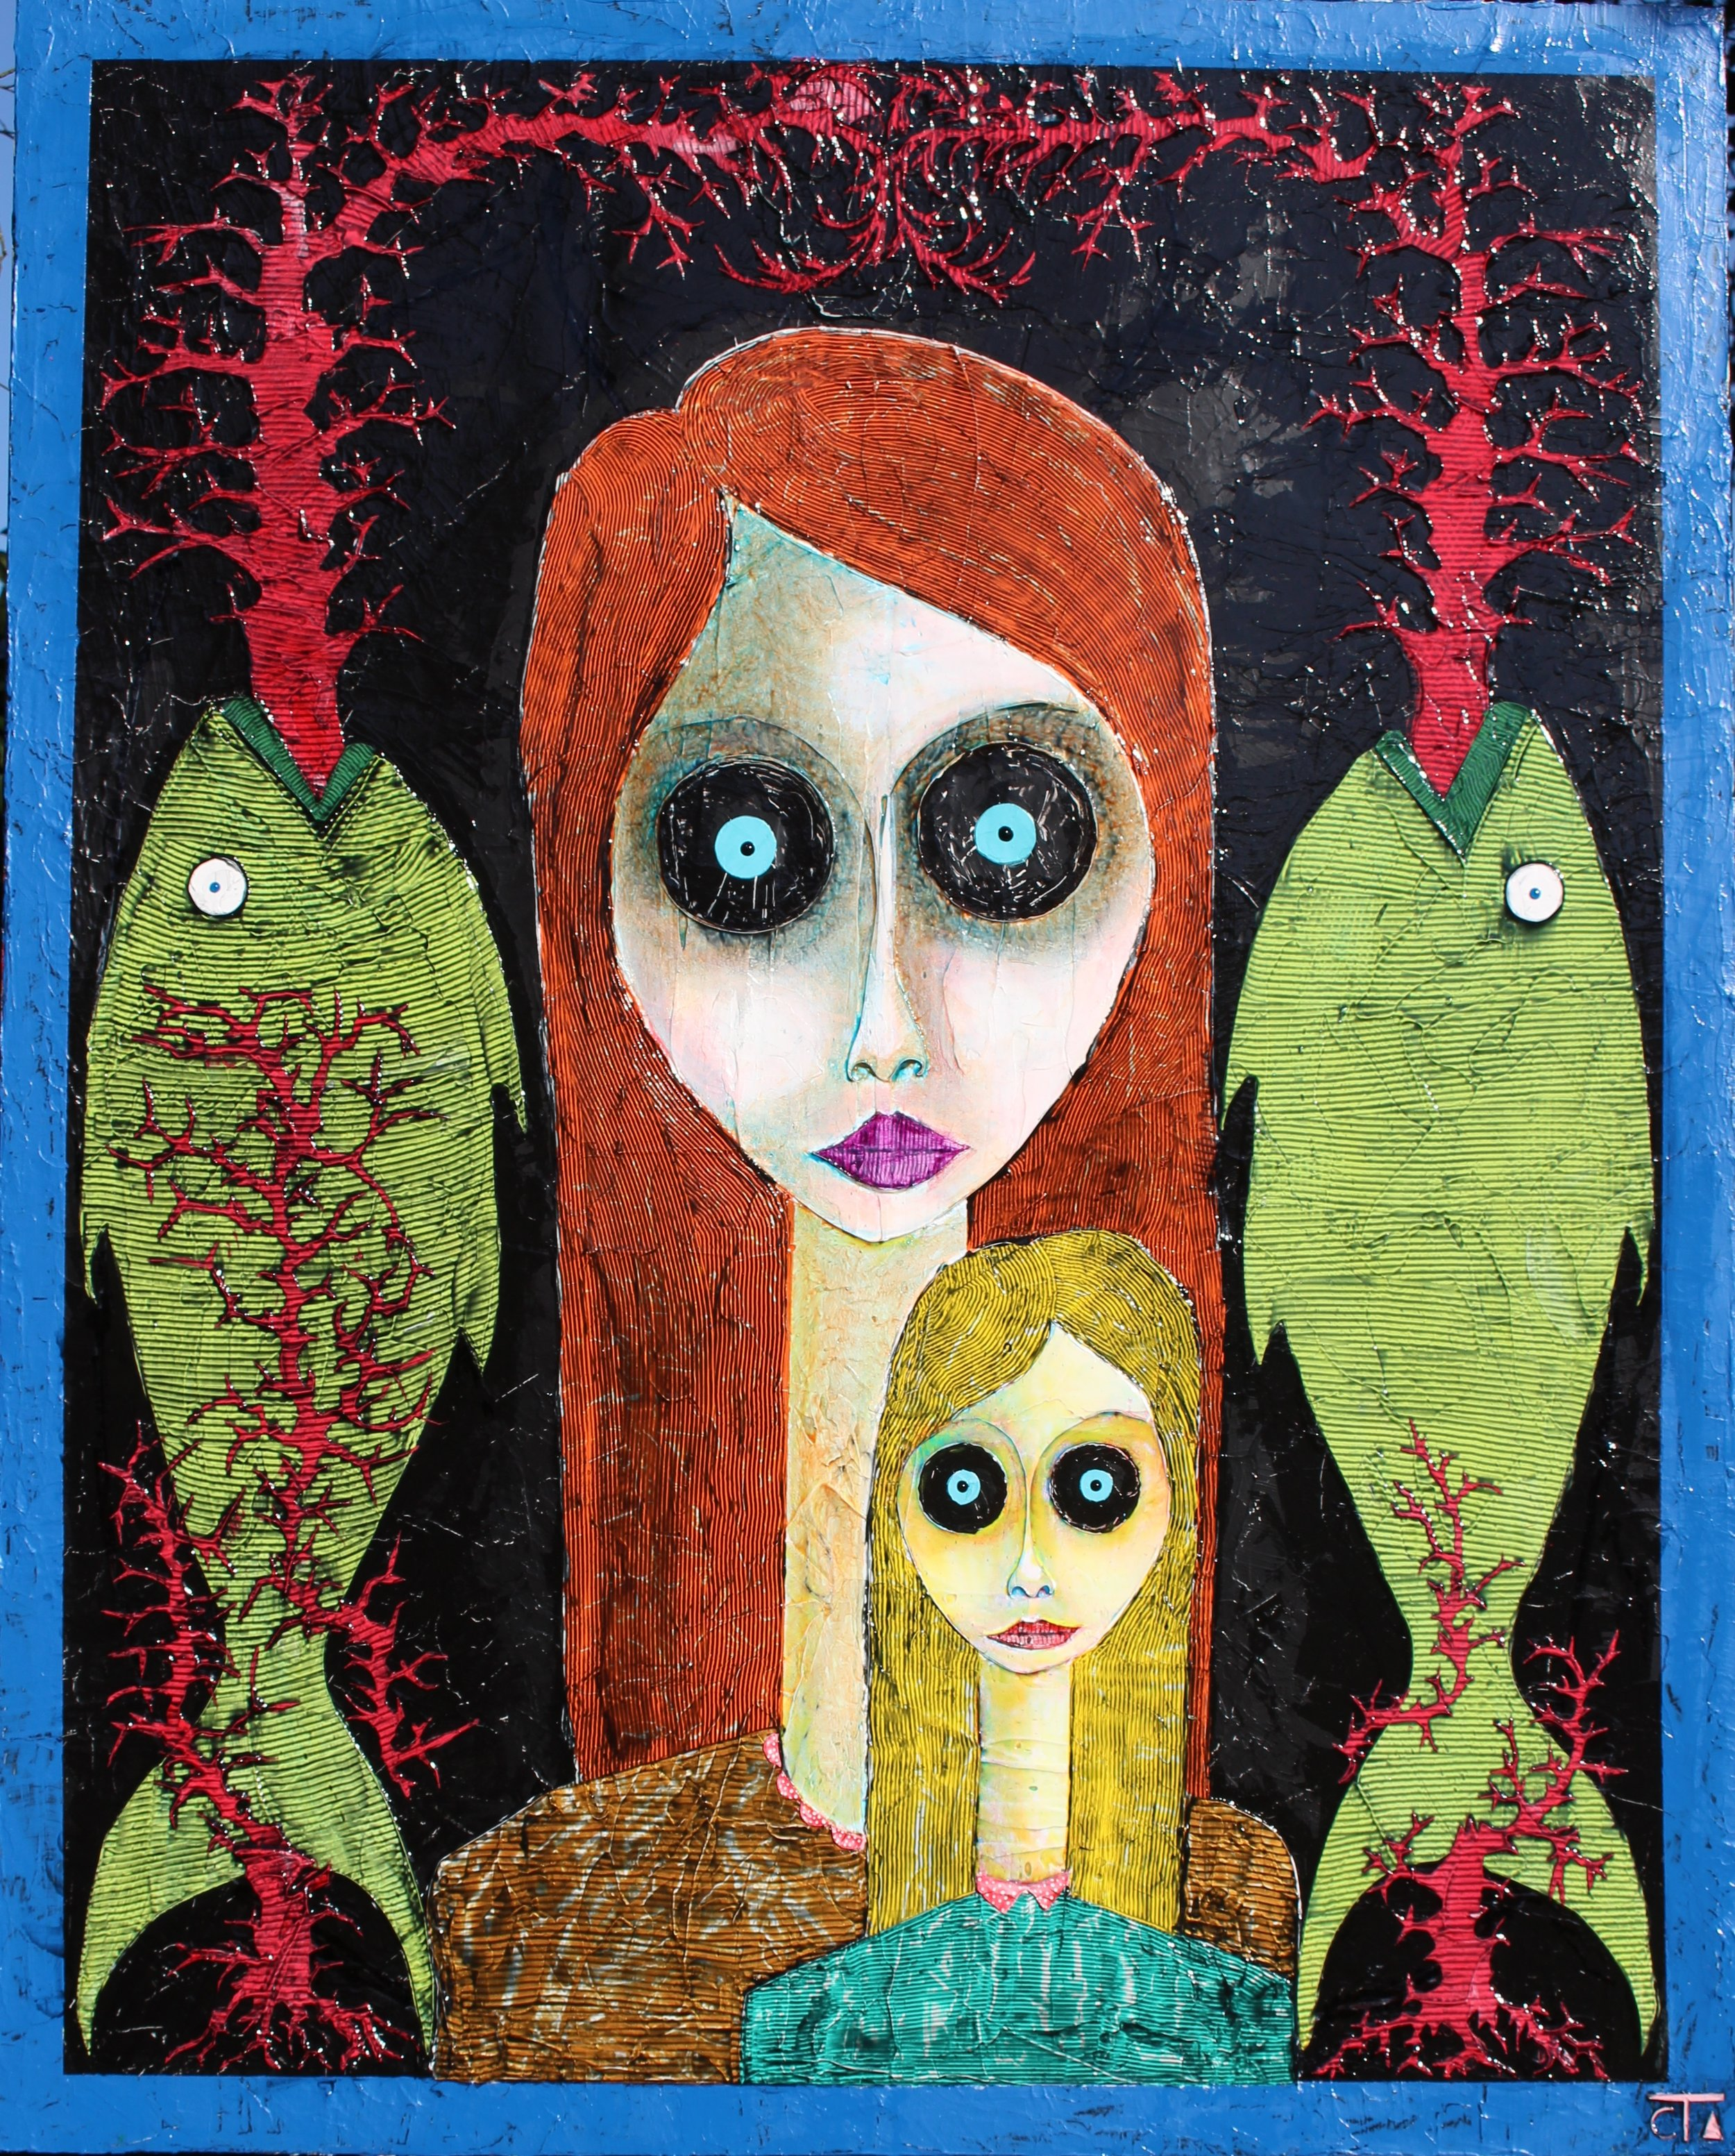 Mère-Enfant-Entité- Scénographie Christine DEOM.jpg